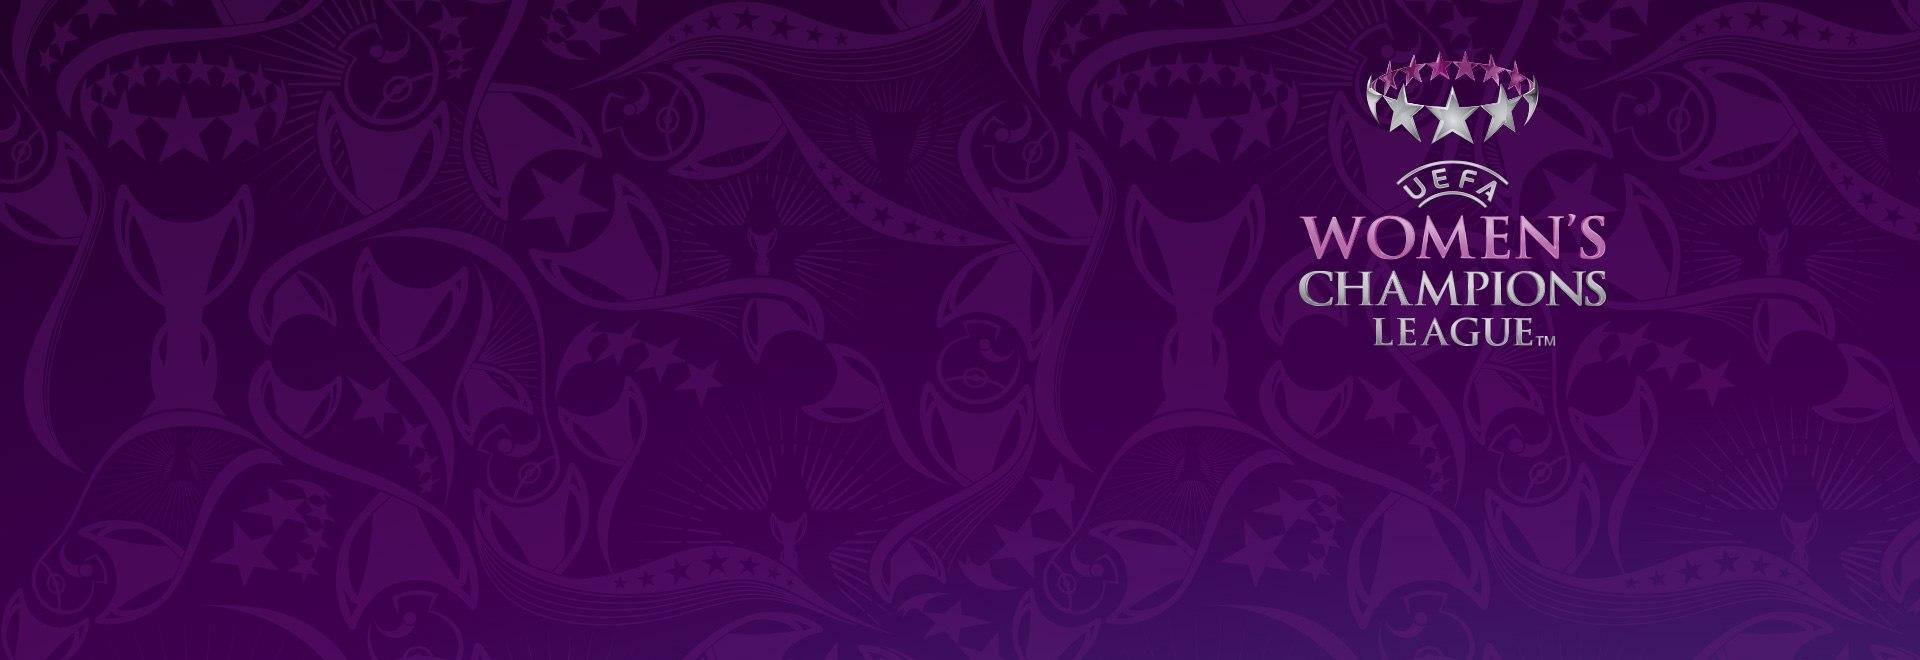 Slavia Praga - Fiorentina. 16mi Ritono